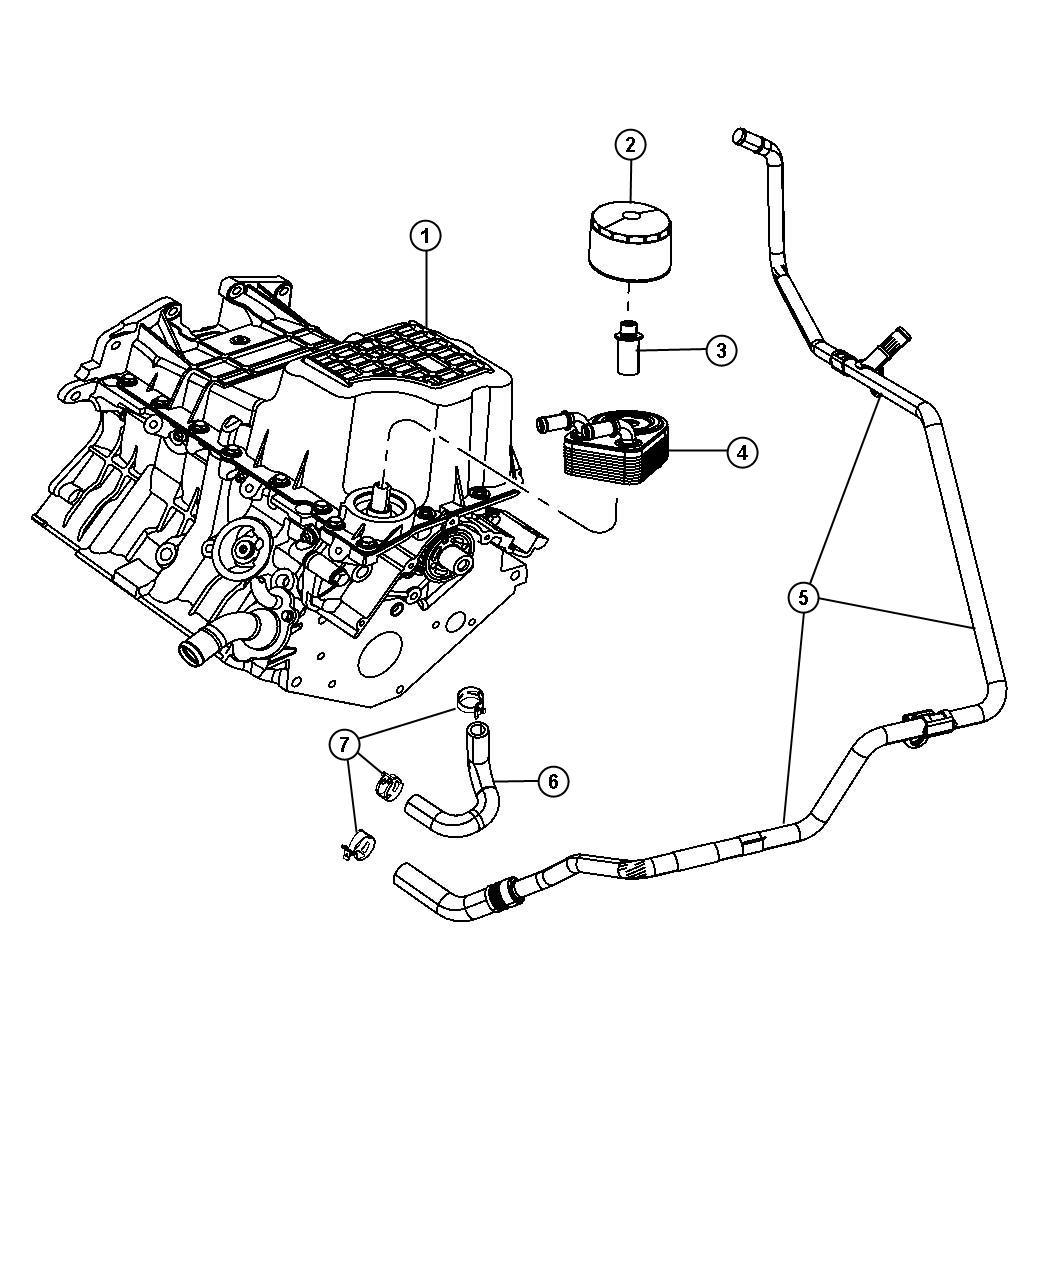 Engine Oil Cooler Oil Filter And Coolant Tubes 4 0l Egq